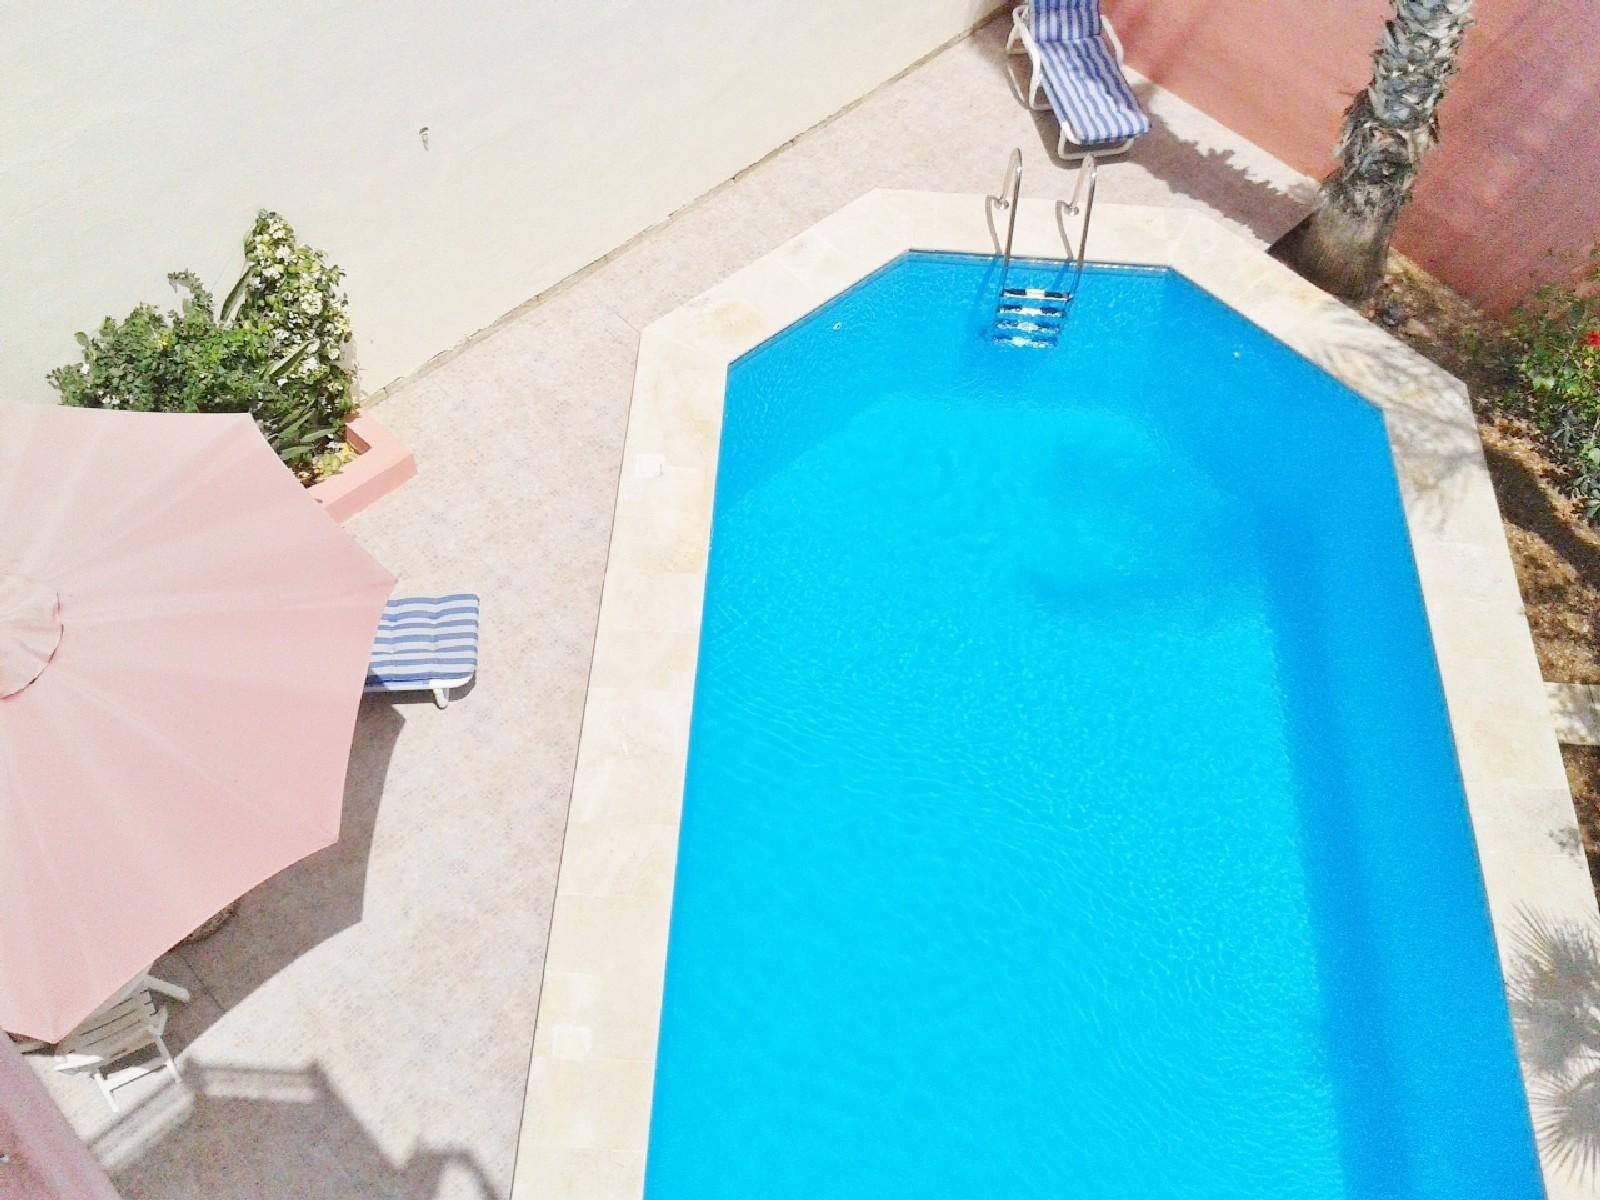 Single Family Home for Sale at Semi-Detached Villa Bahar Ic Caghaq, Sliema Valletta Surroundings Malta